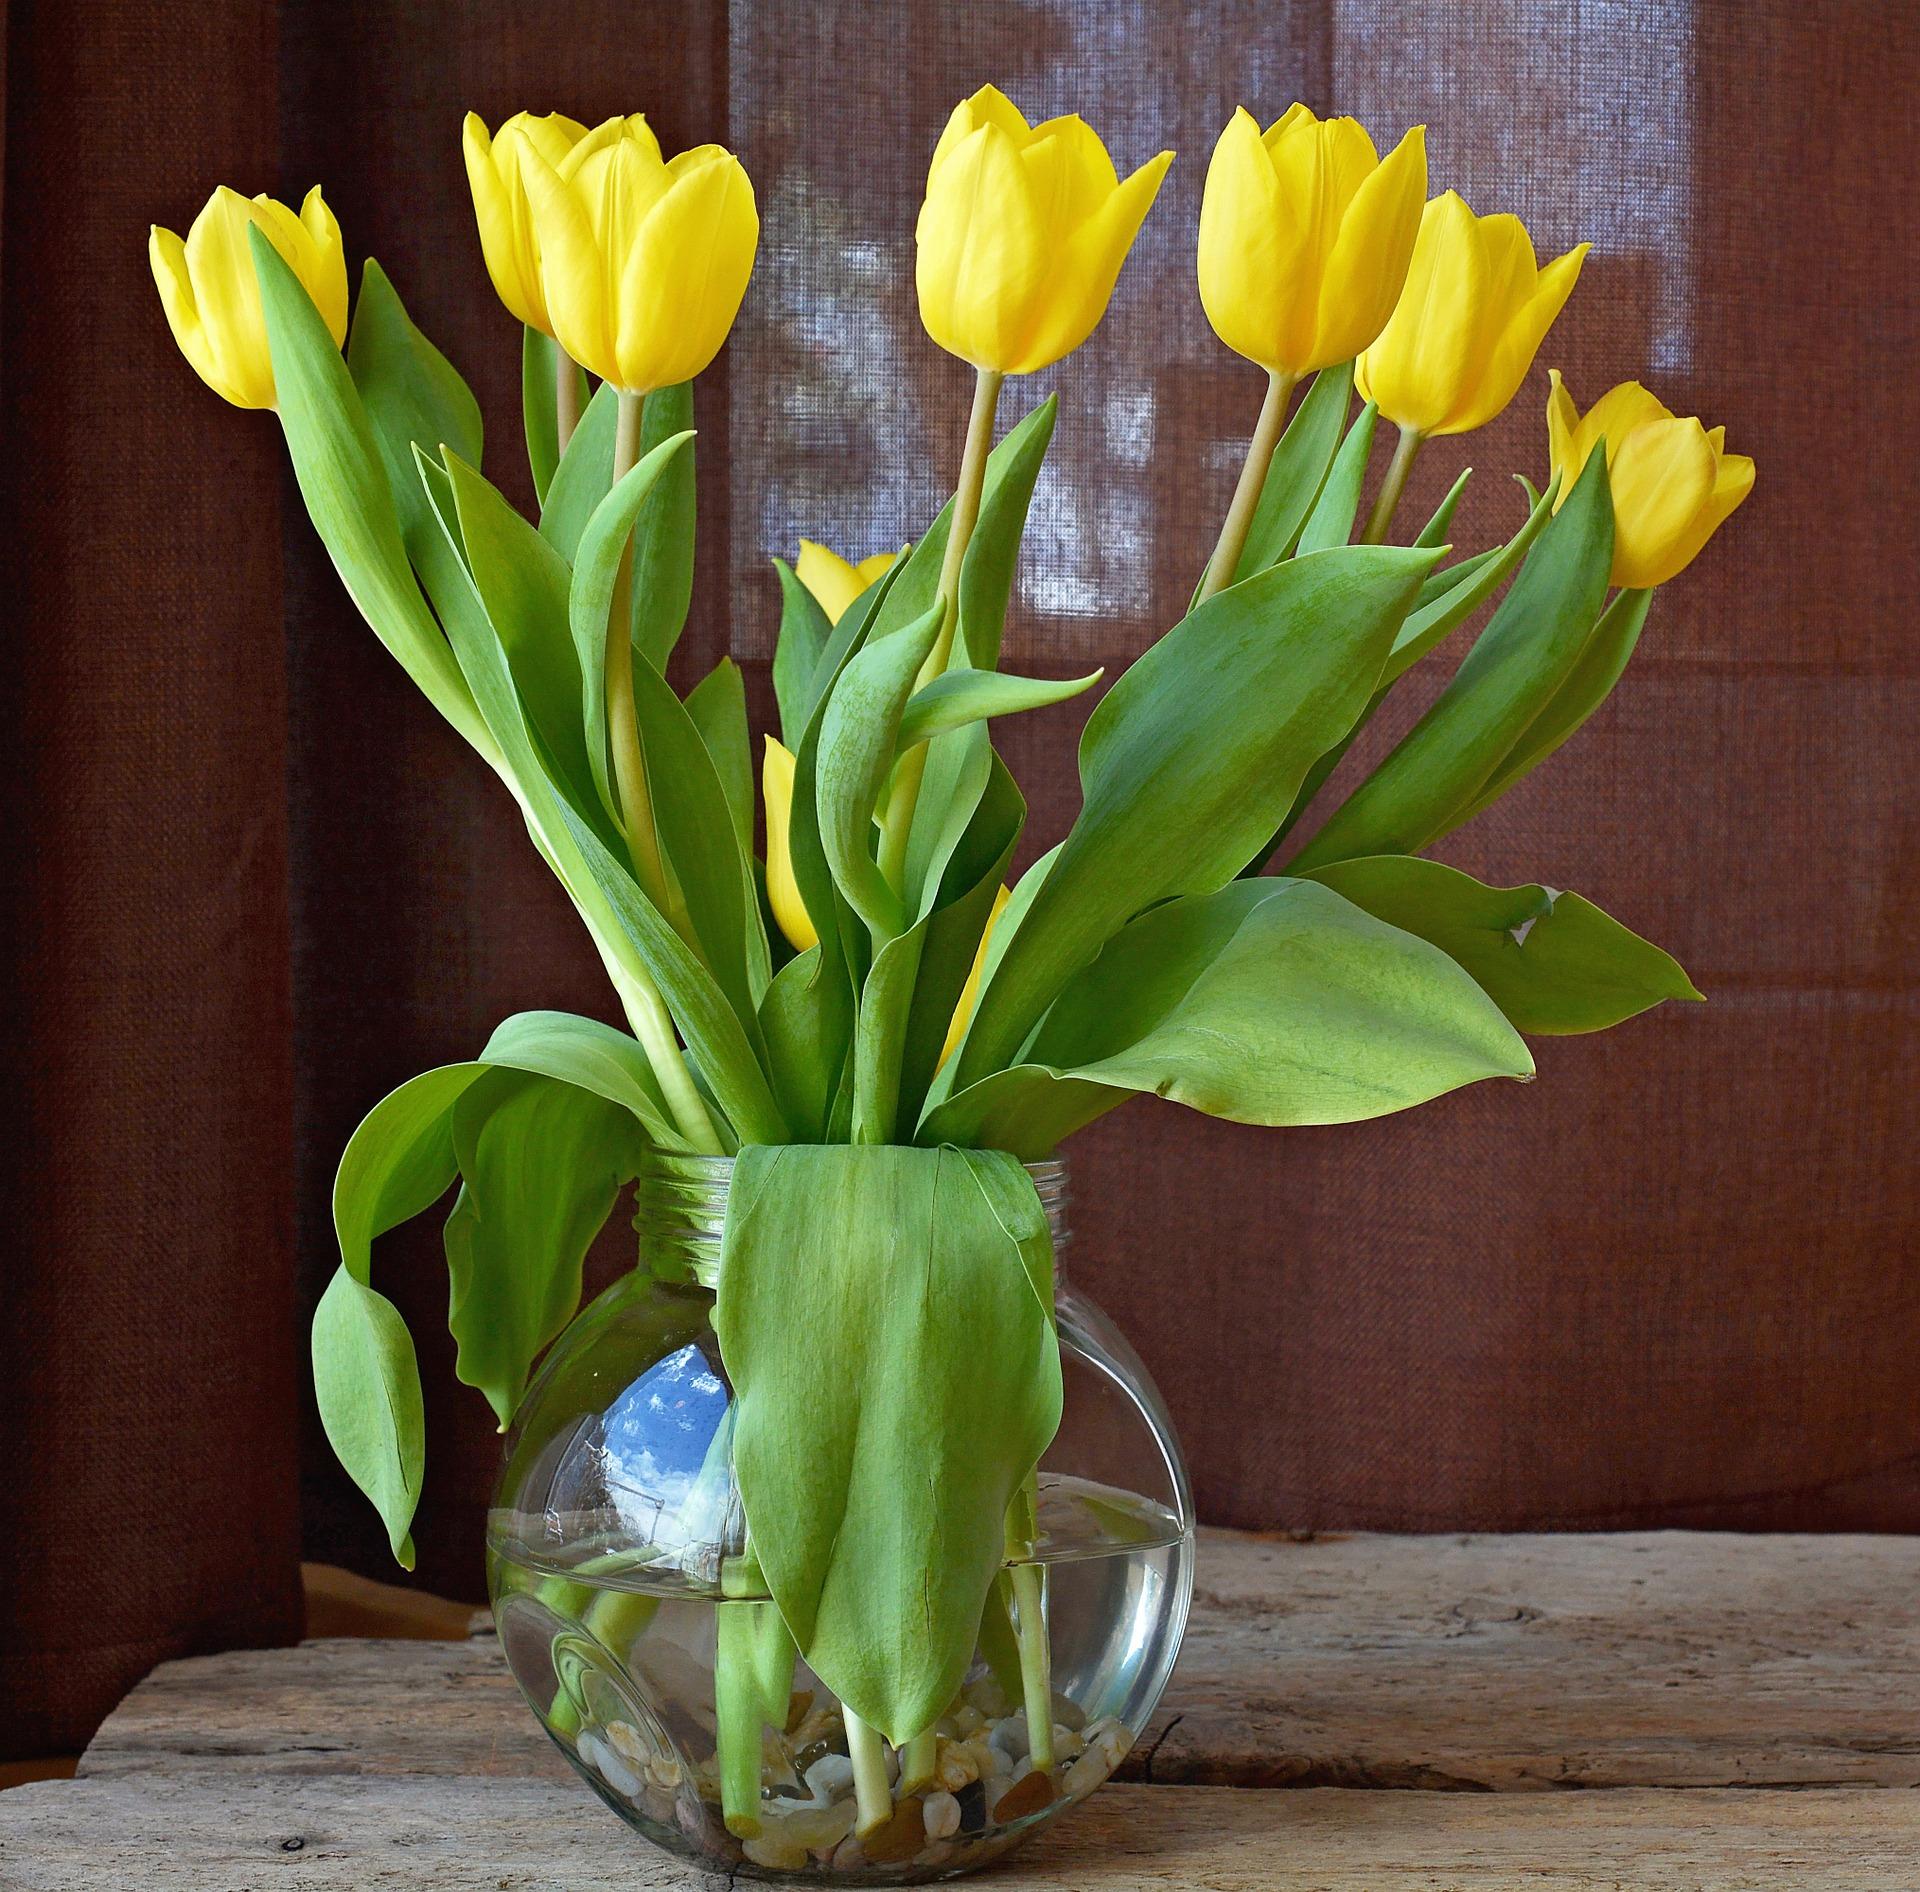 tulips-719365_1920.jpg